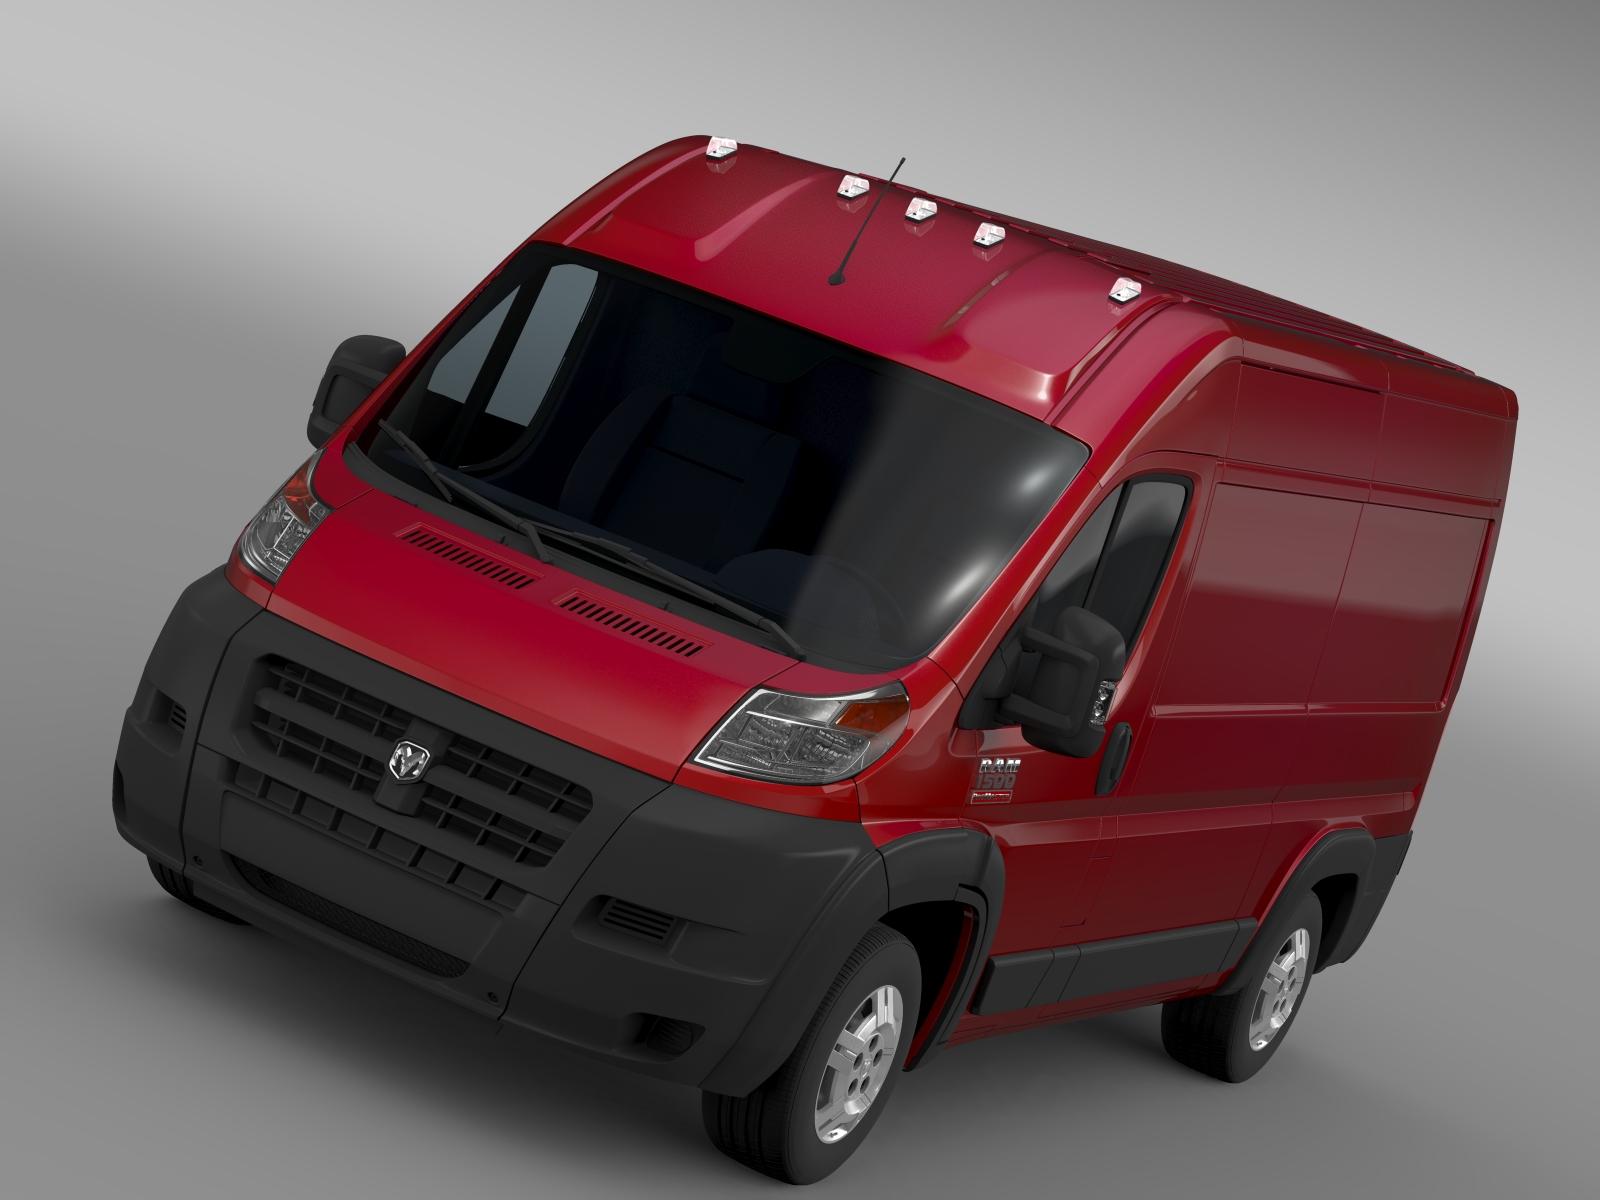 ram promaster cargo 1500 hr 136wb 2015 3d model 3ds max fbx c4d lwo ma mb hrc xsi obj 209380